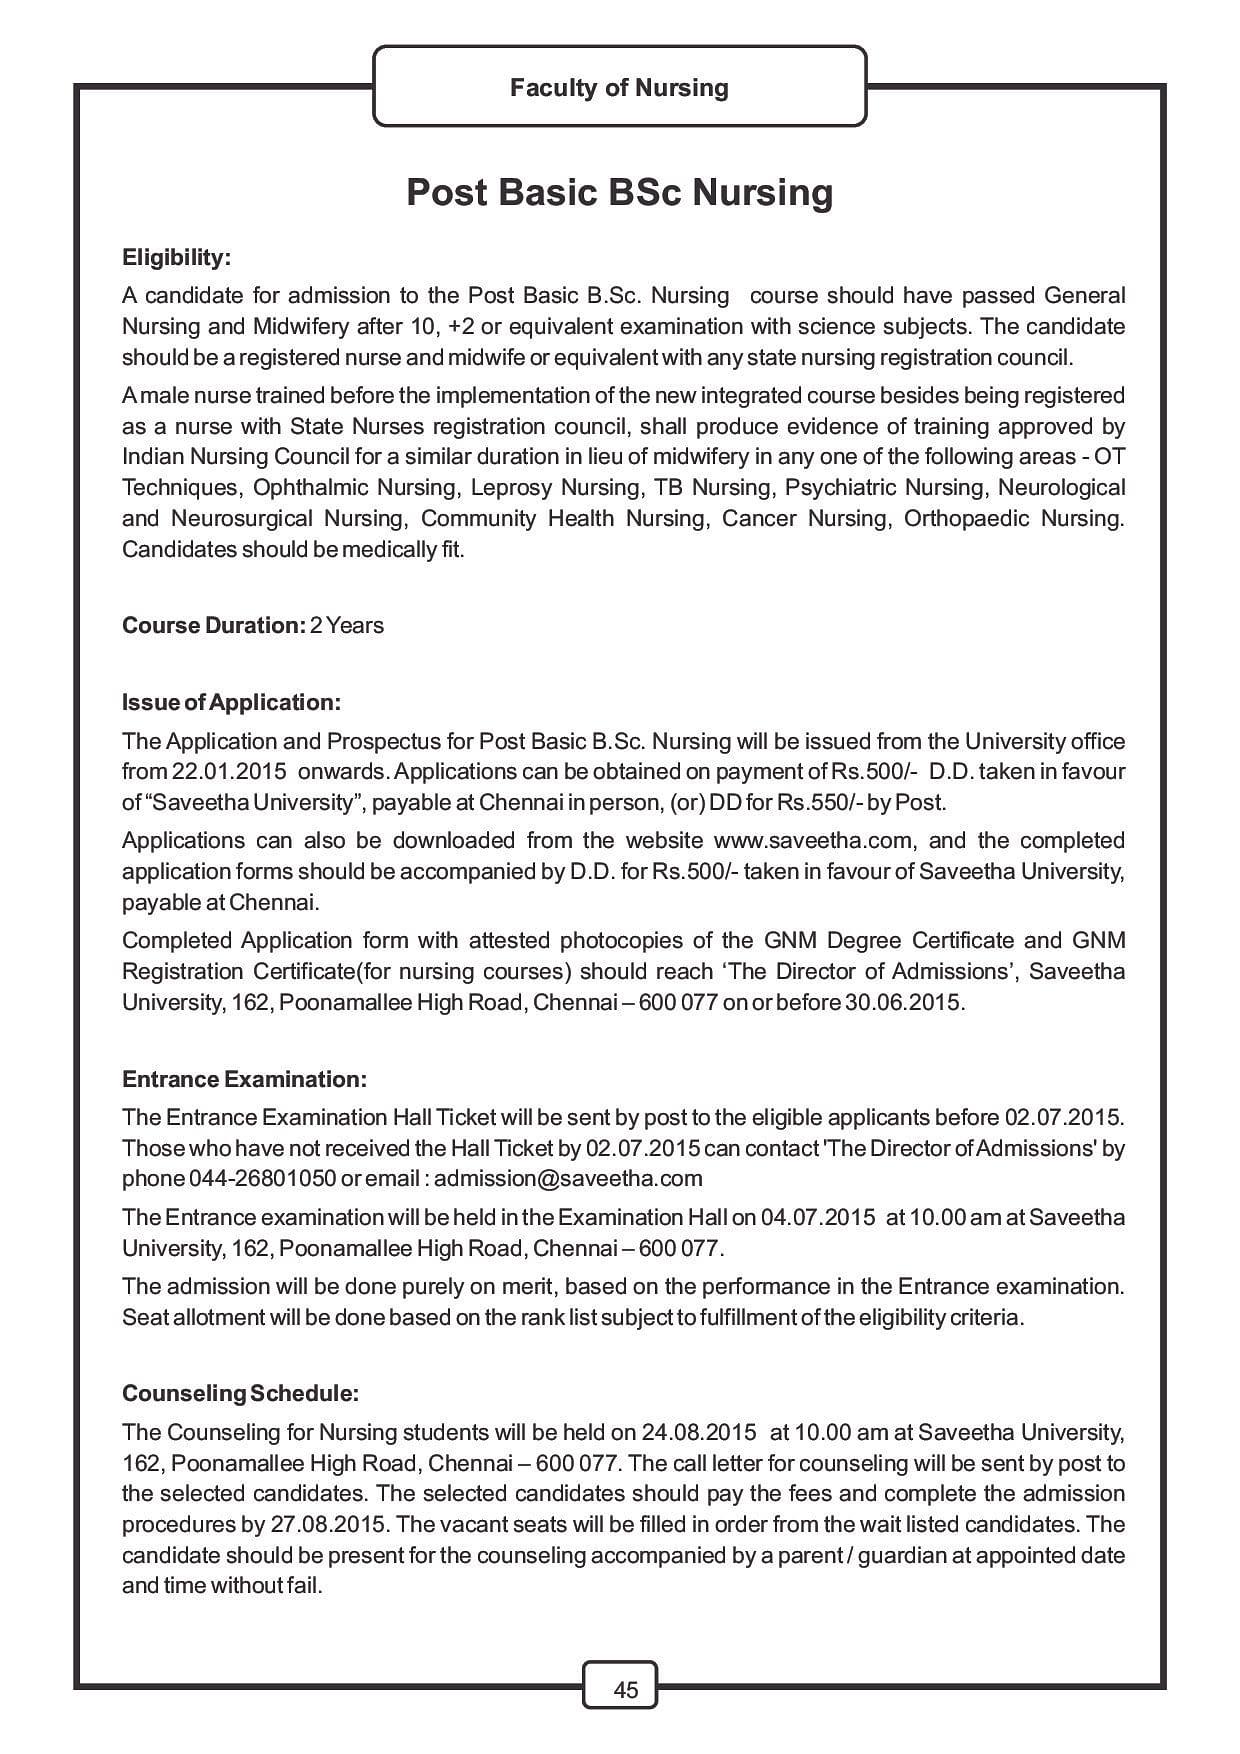 Saveetha university chennai admissions contact website saveetha university chennai college information brochure b nursingpost basic aiddatafo Gallery